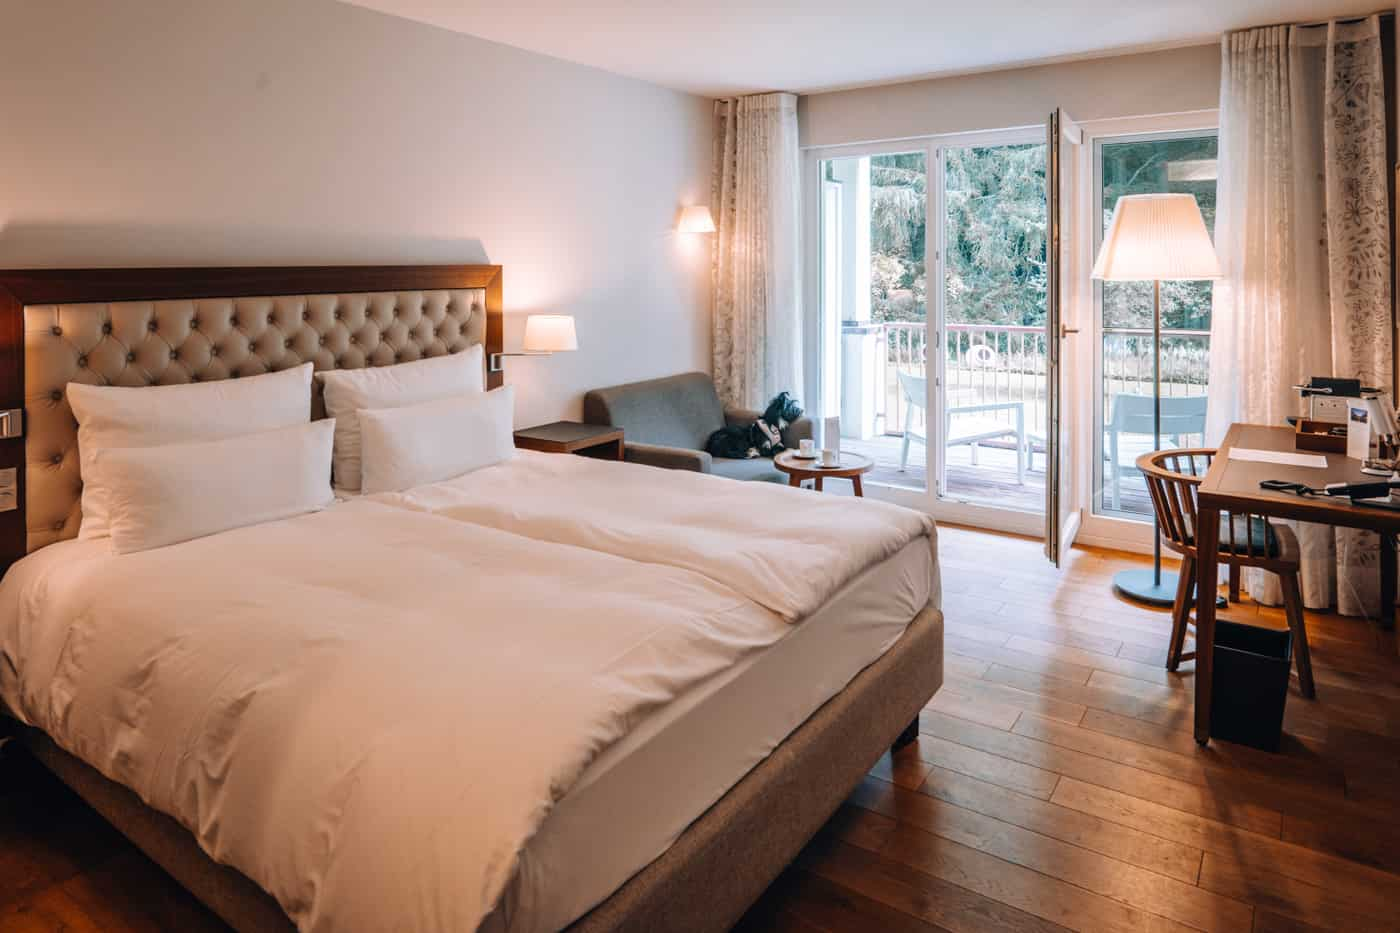 Ausflugsziele Stuttgart - Hoteltipp: Das Waldhotel Stuttgart